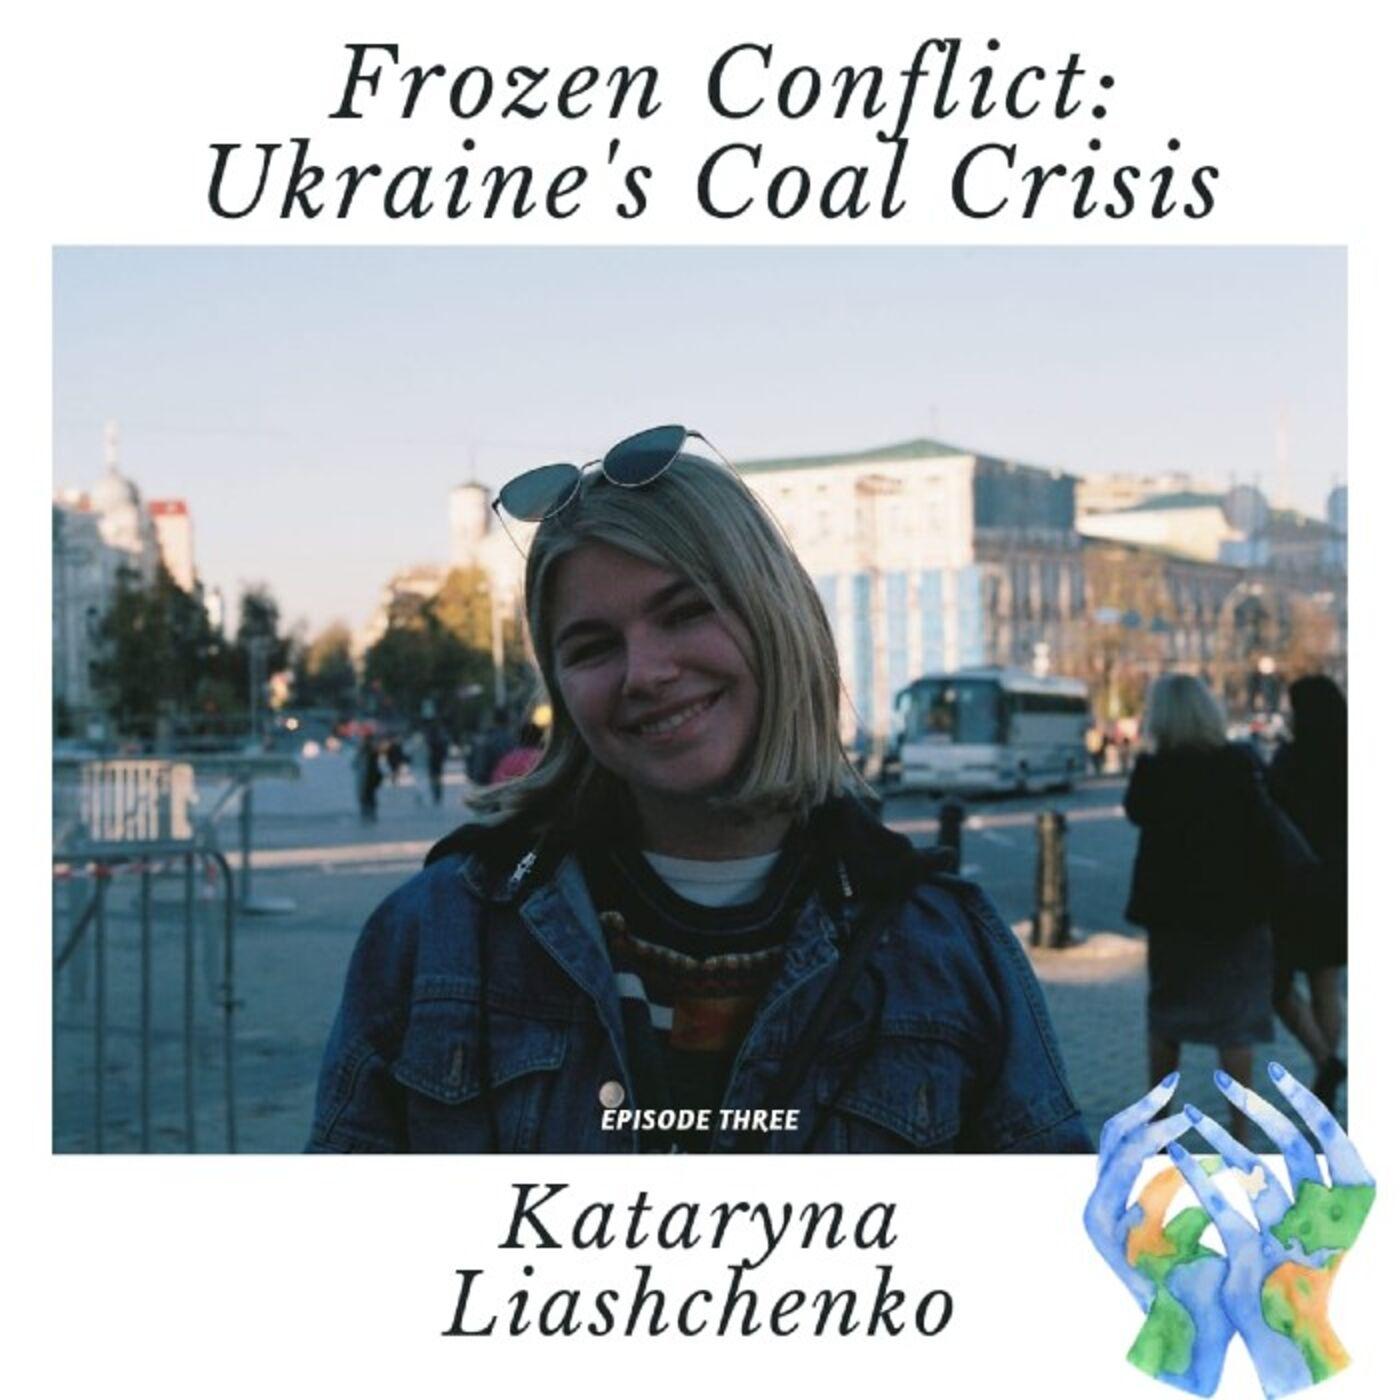 Frozen Conflict: Ukraine's Coal Crisis with Kataryna Liashchenko